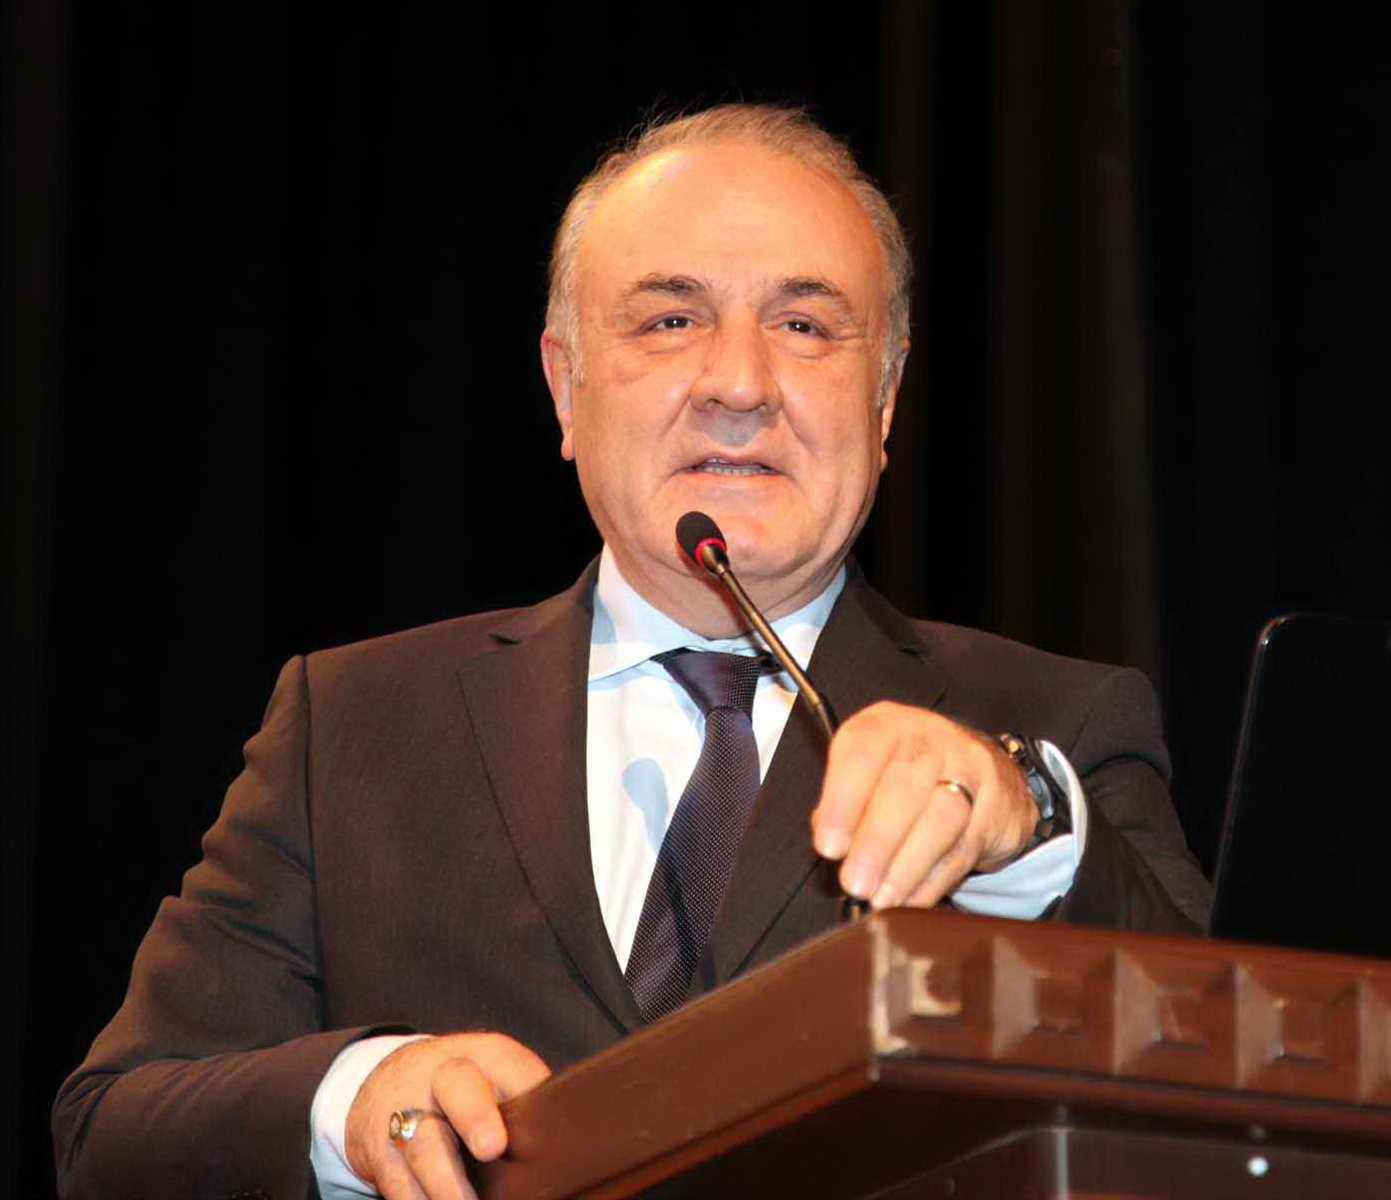 Mehmet_Akif_Ersoy_Anma_Töreni_(5)